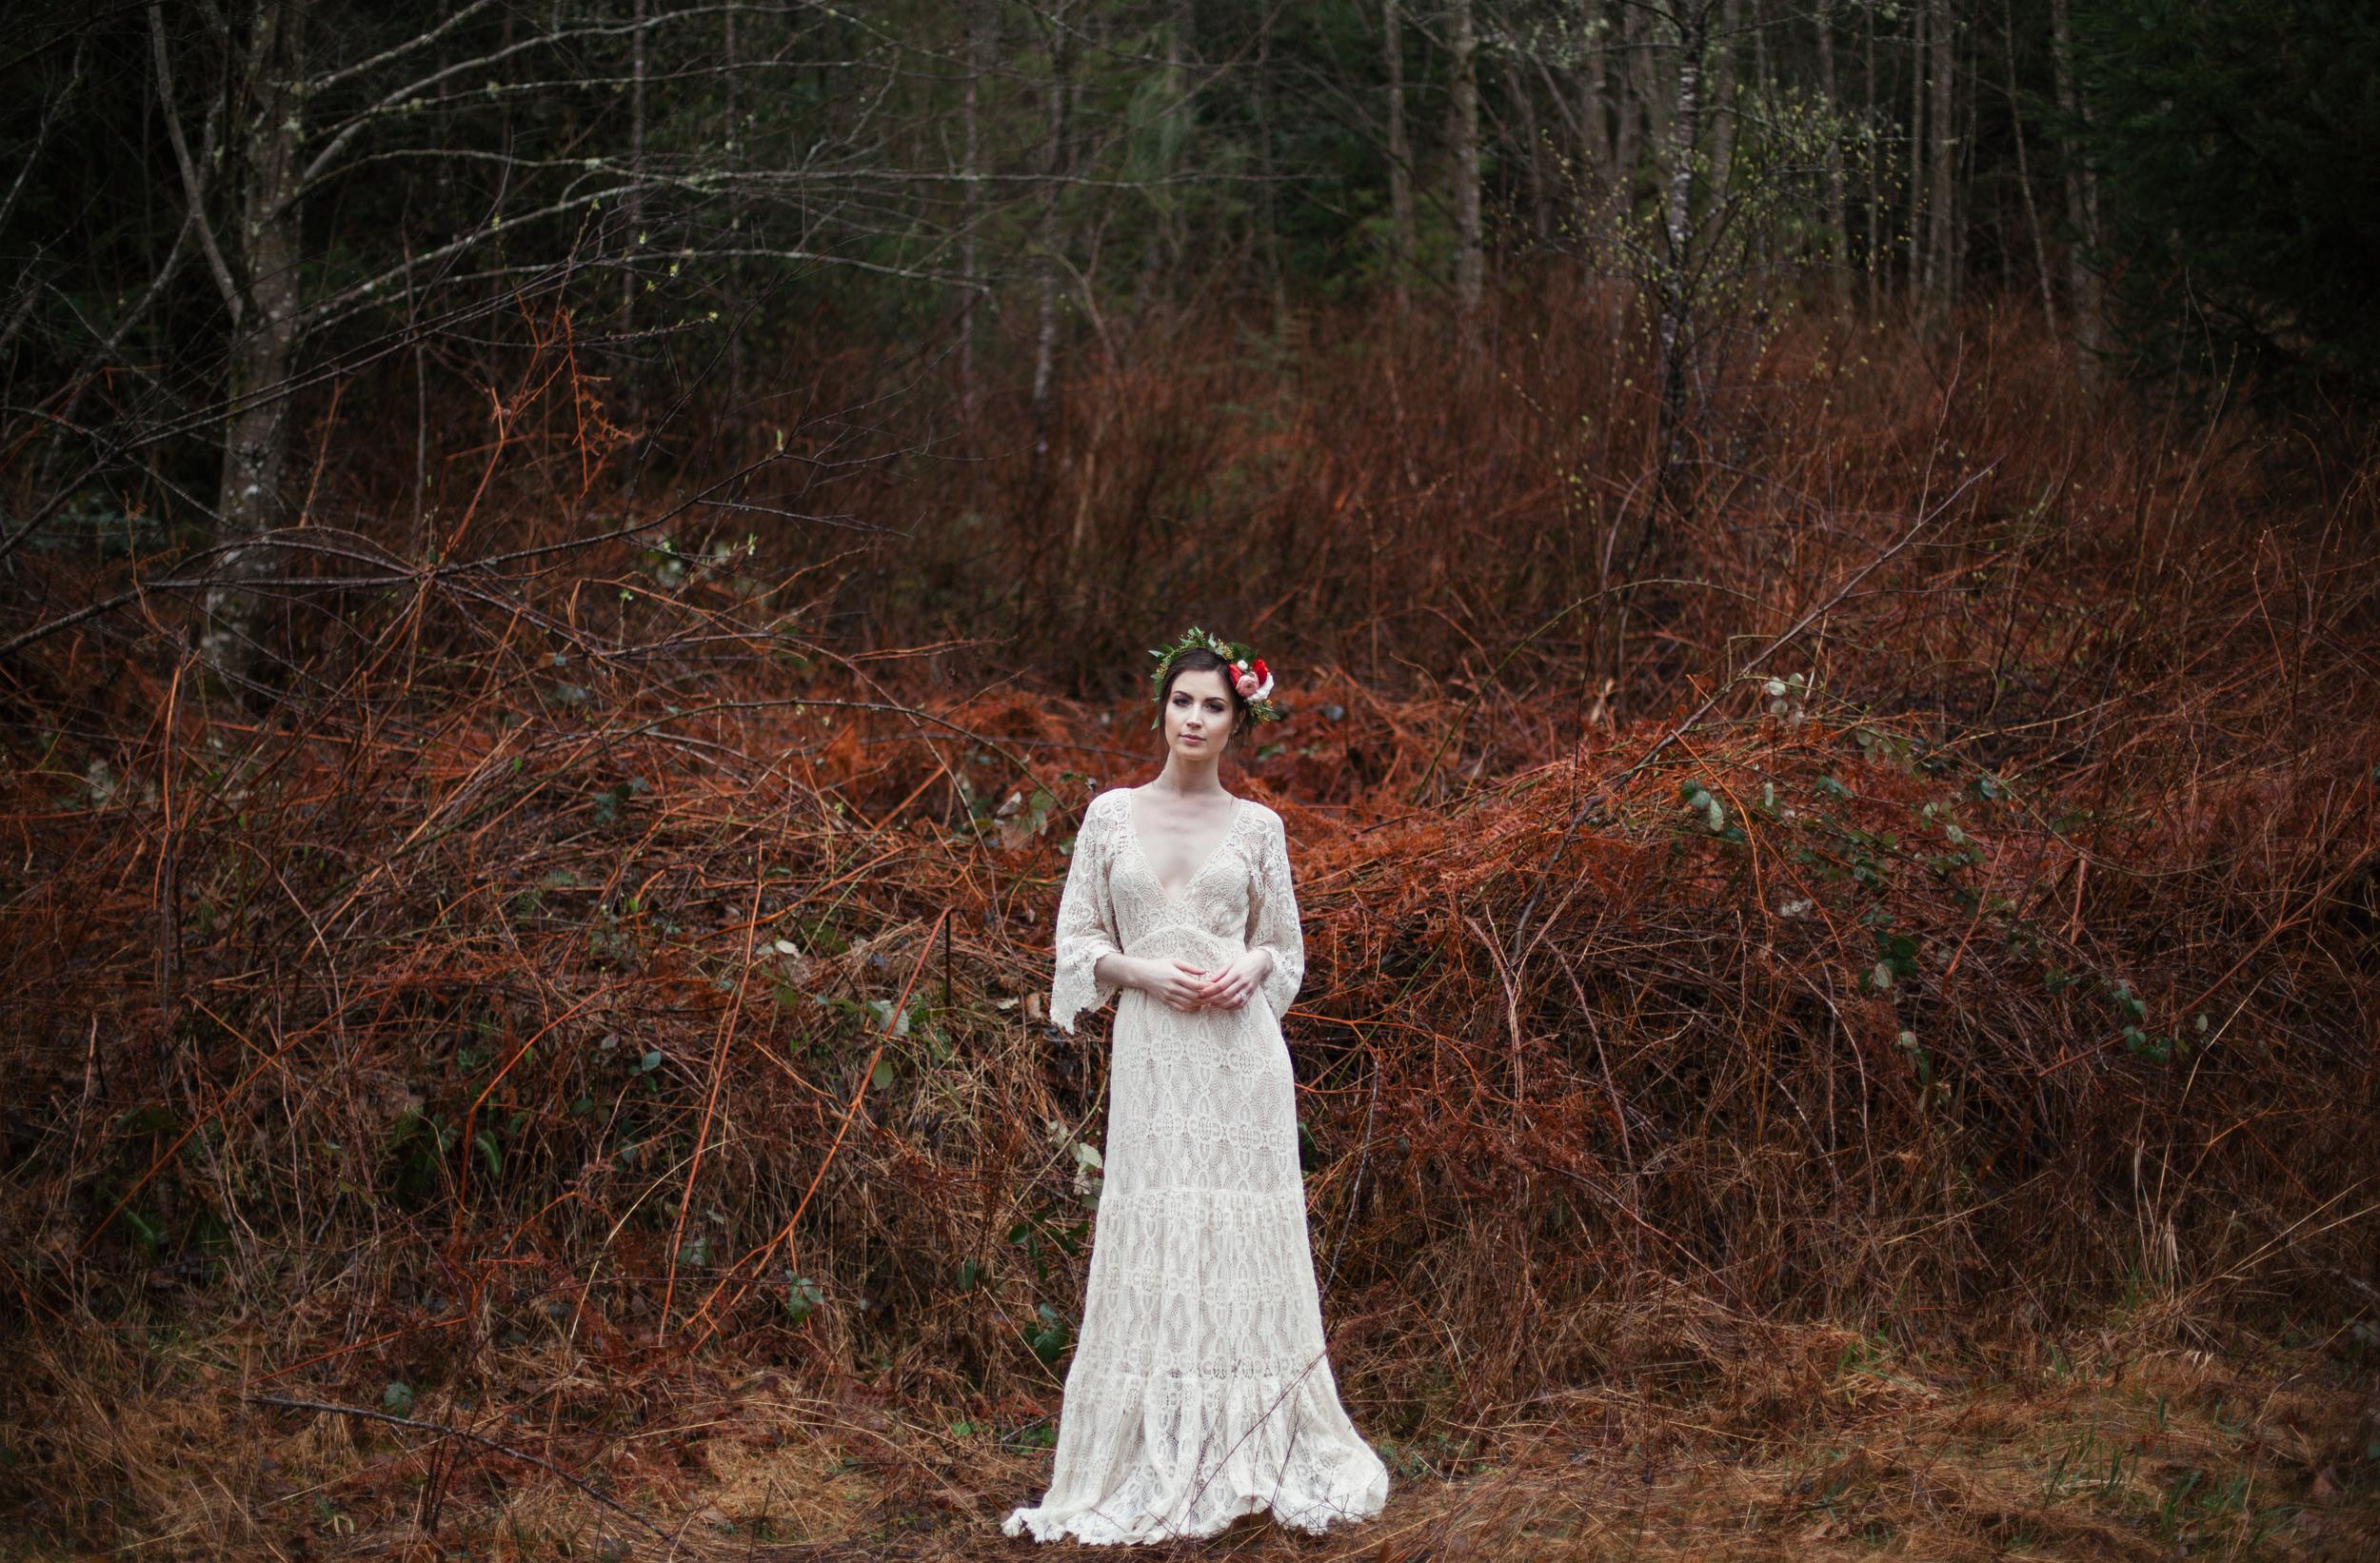 bridal_shoot_ (21 of 60).jpg